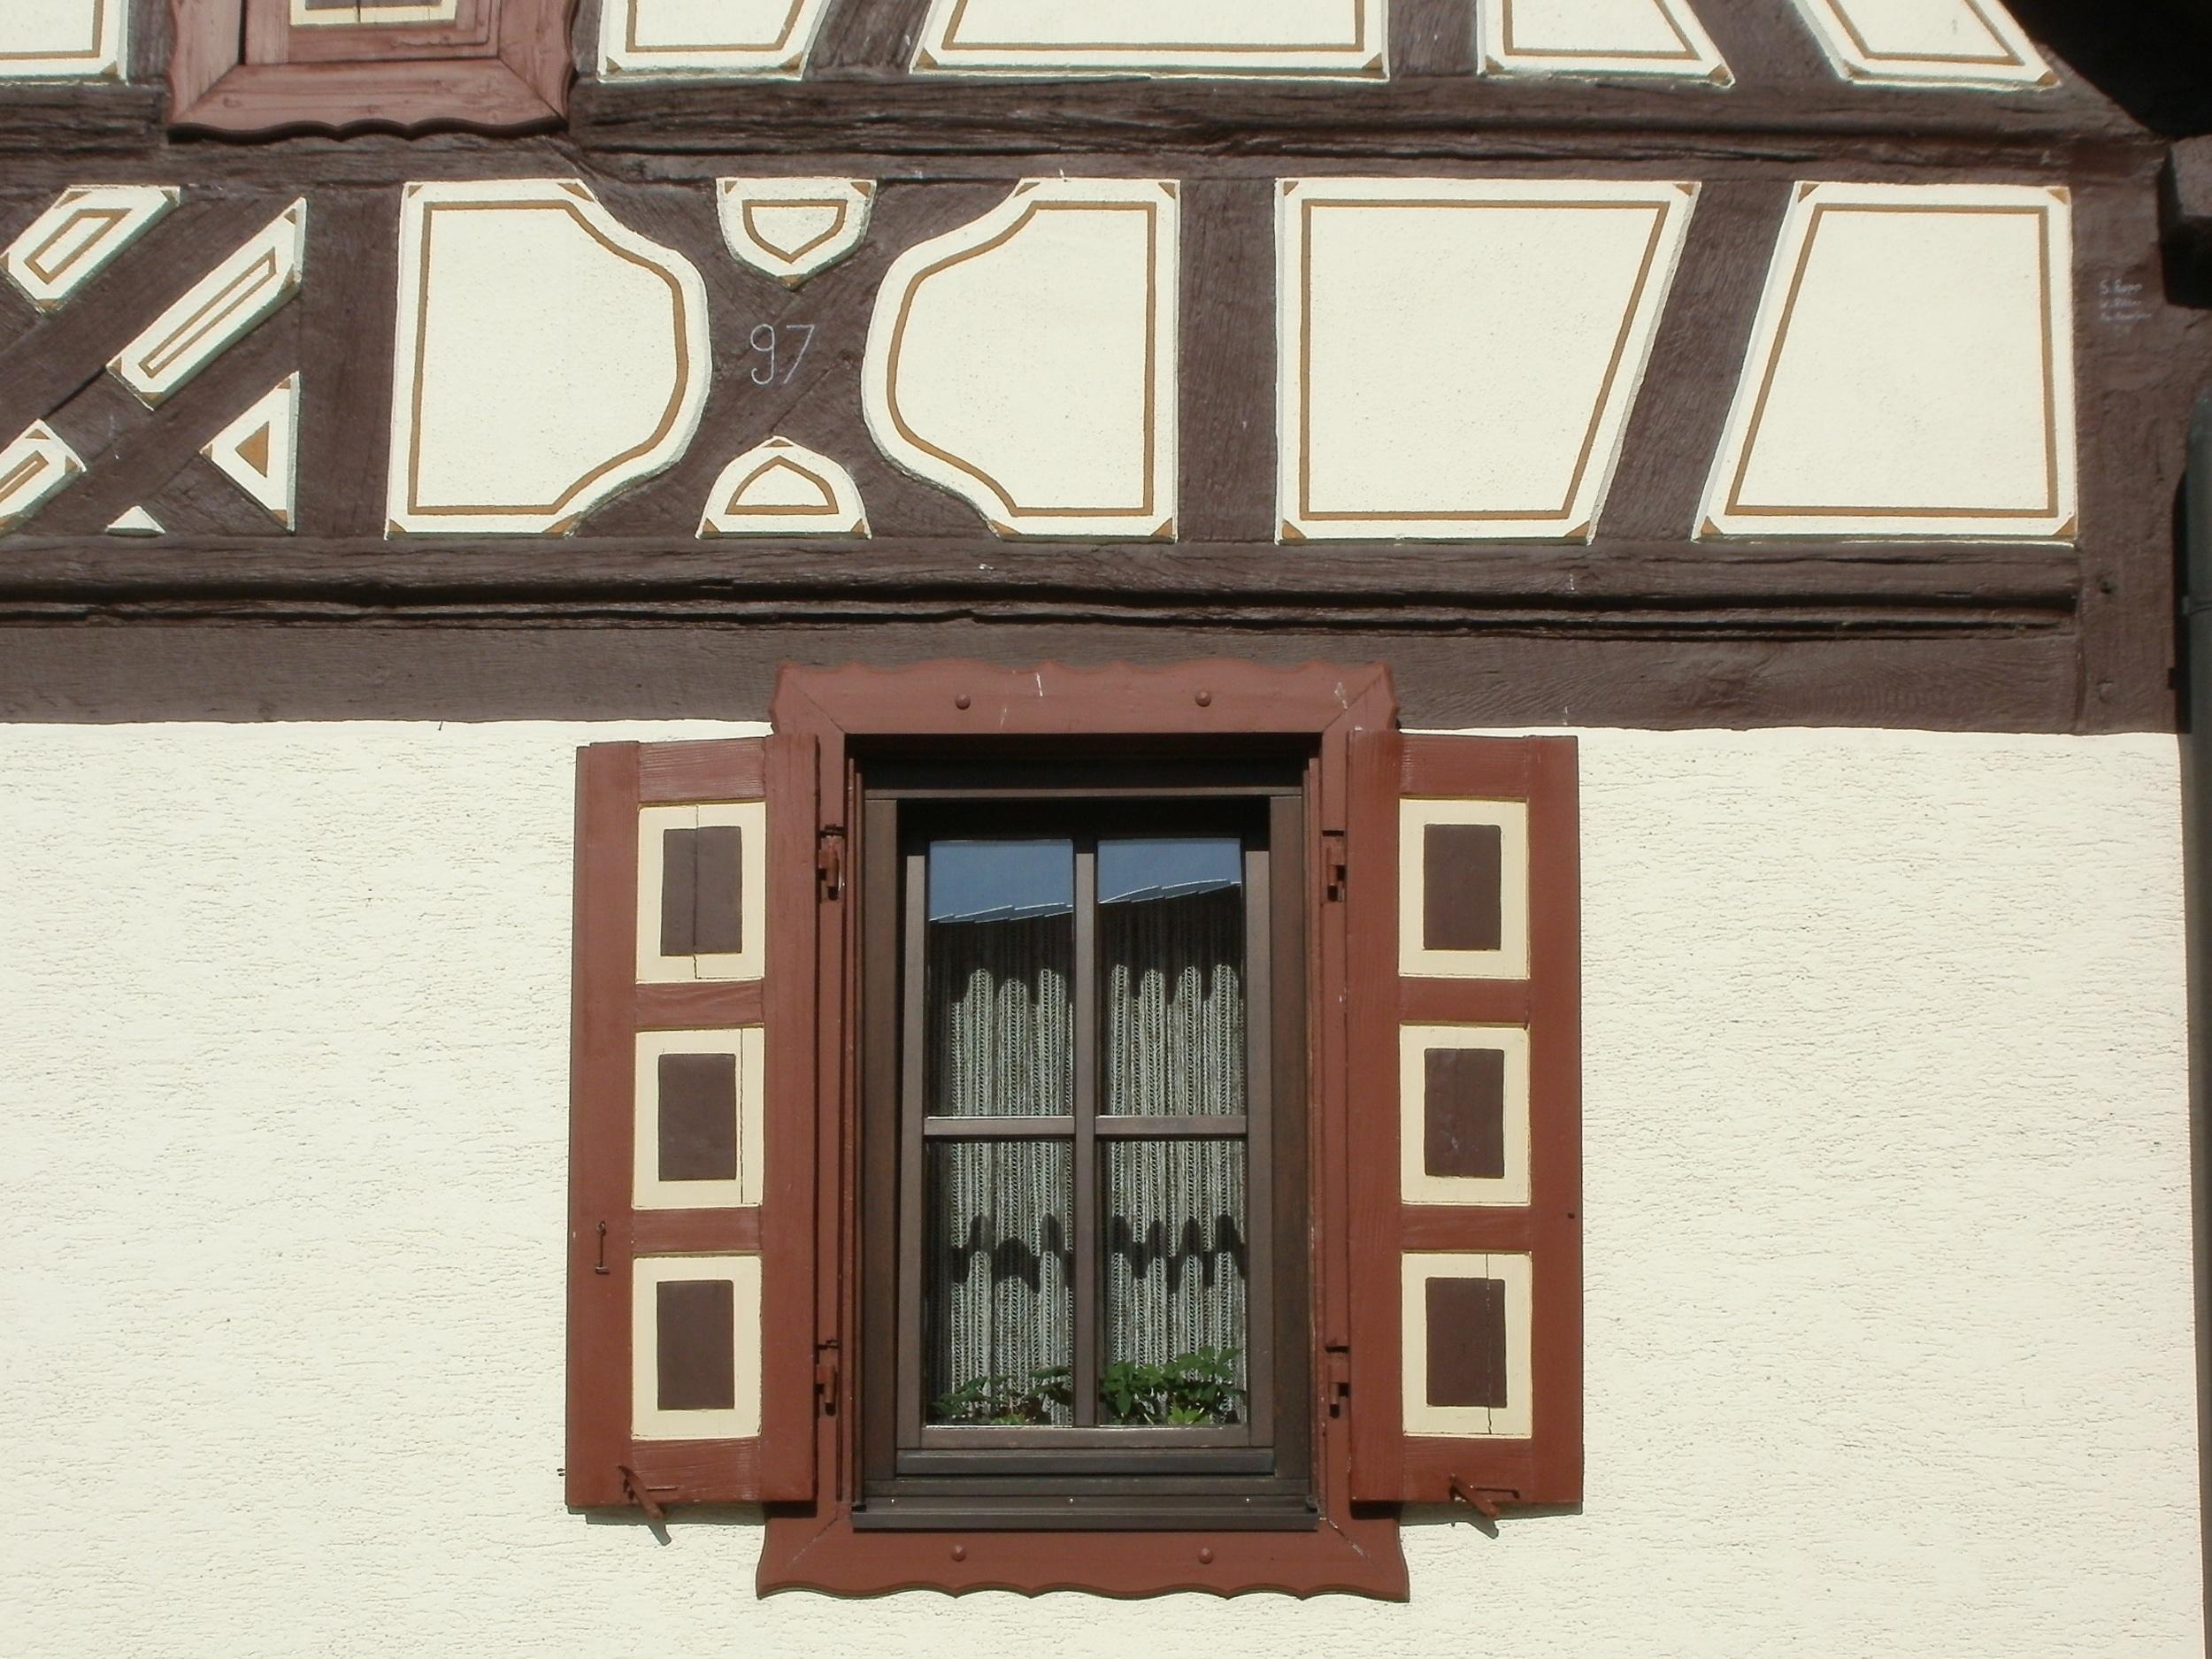 Fotos gratis : arquitectura, estructura, casa, edificio, antiguo ...